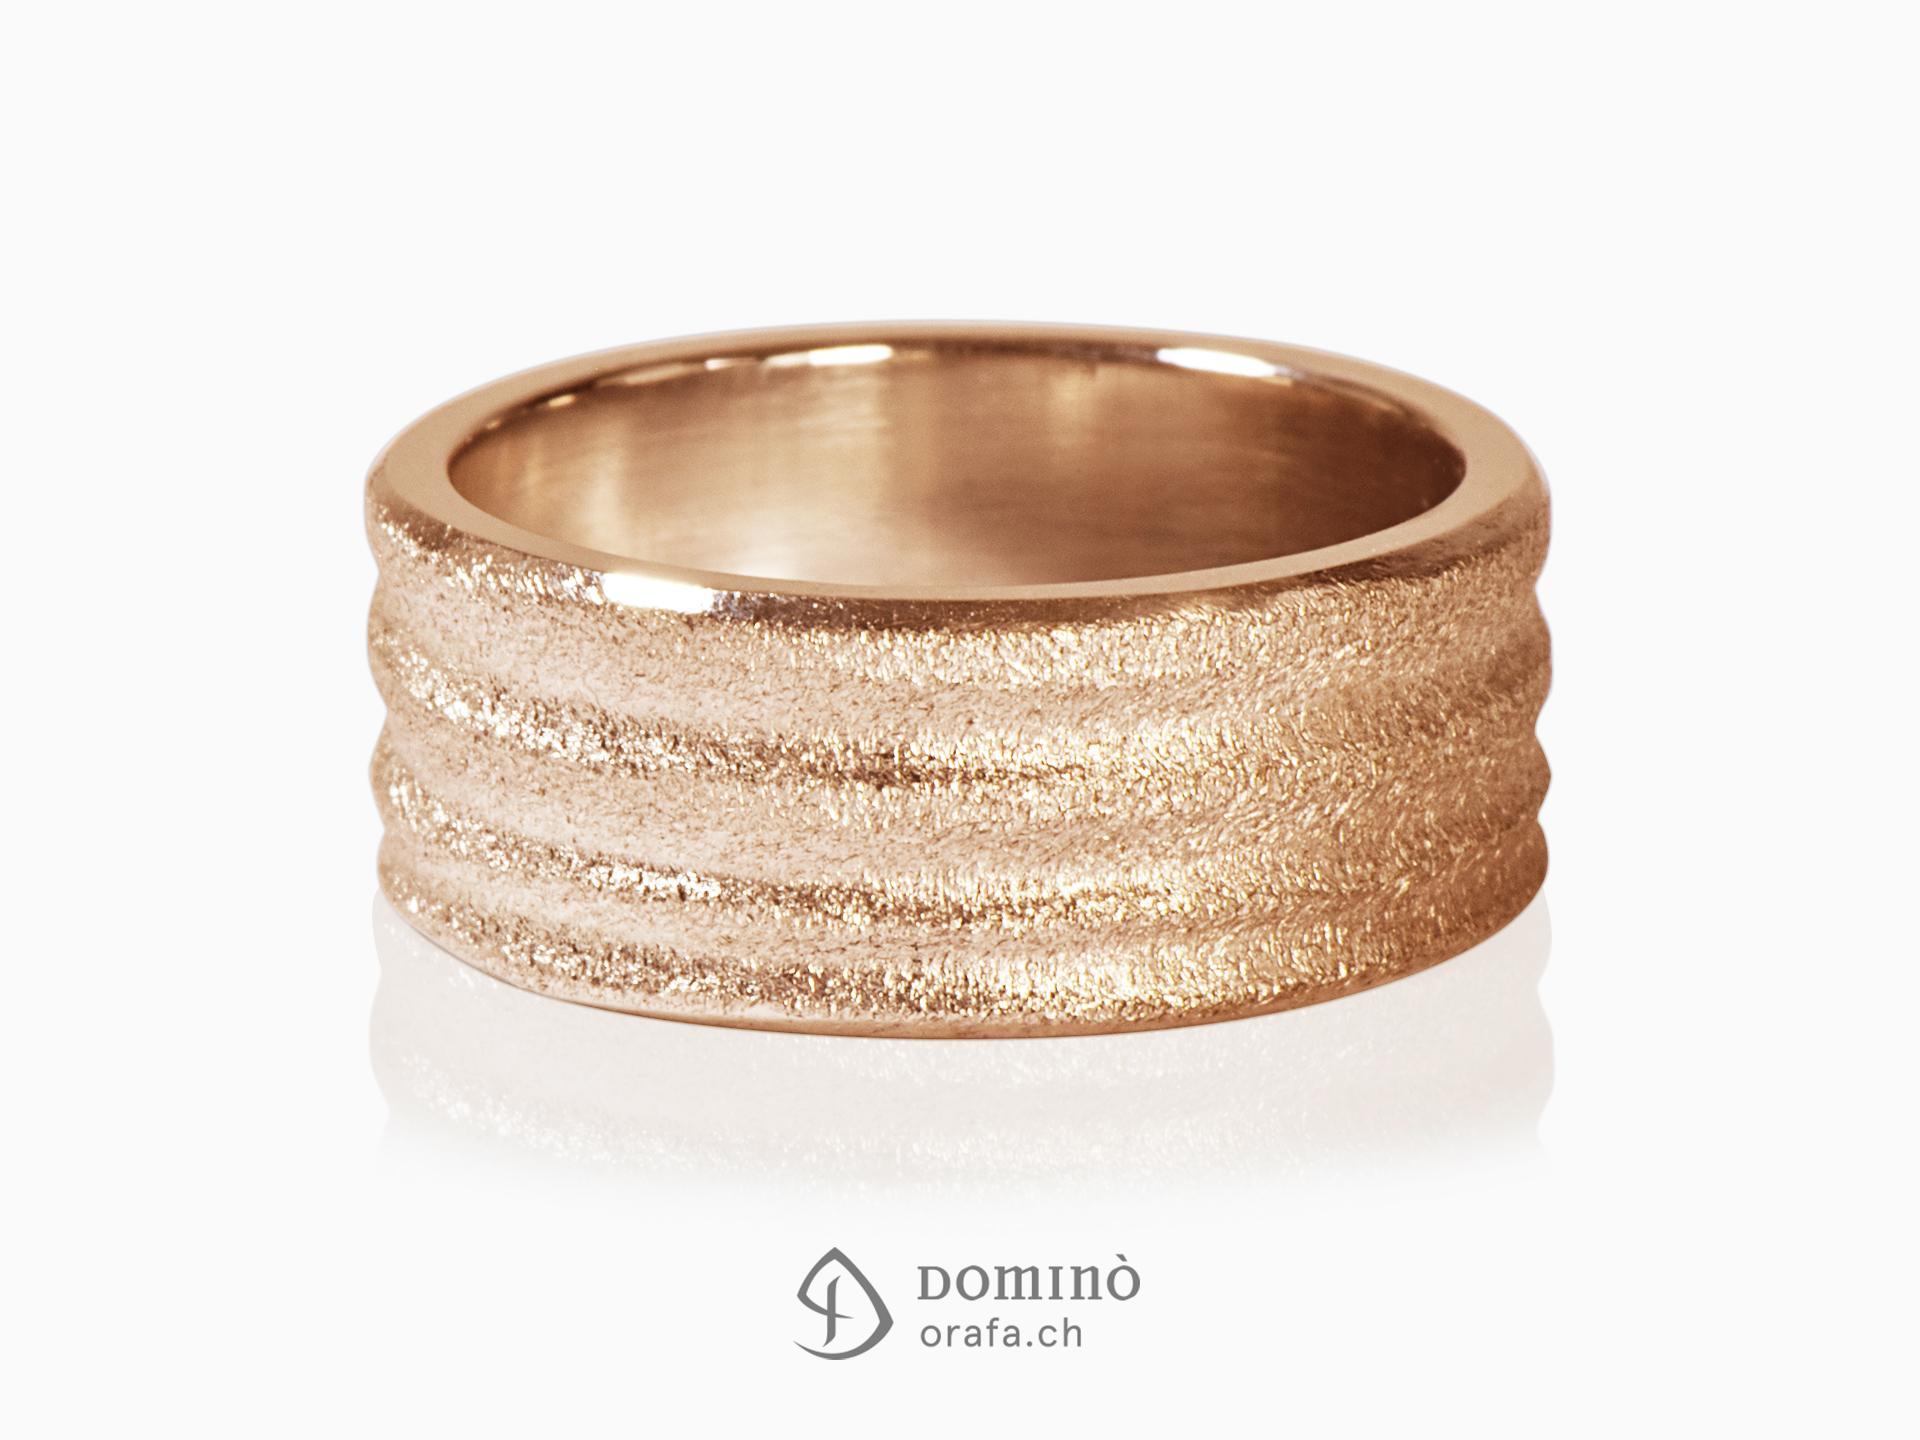 Sandblasted Dune rings